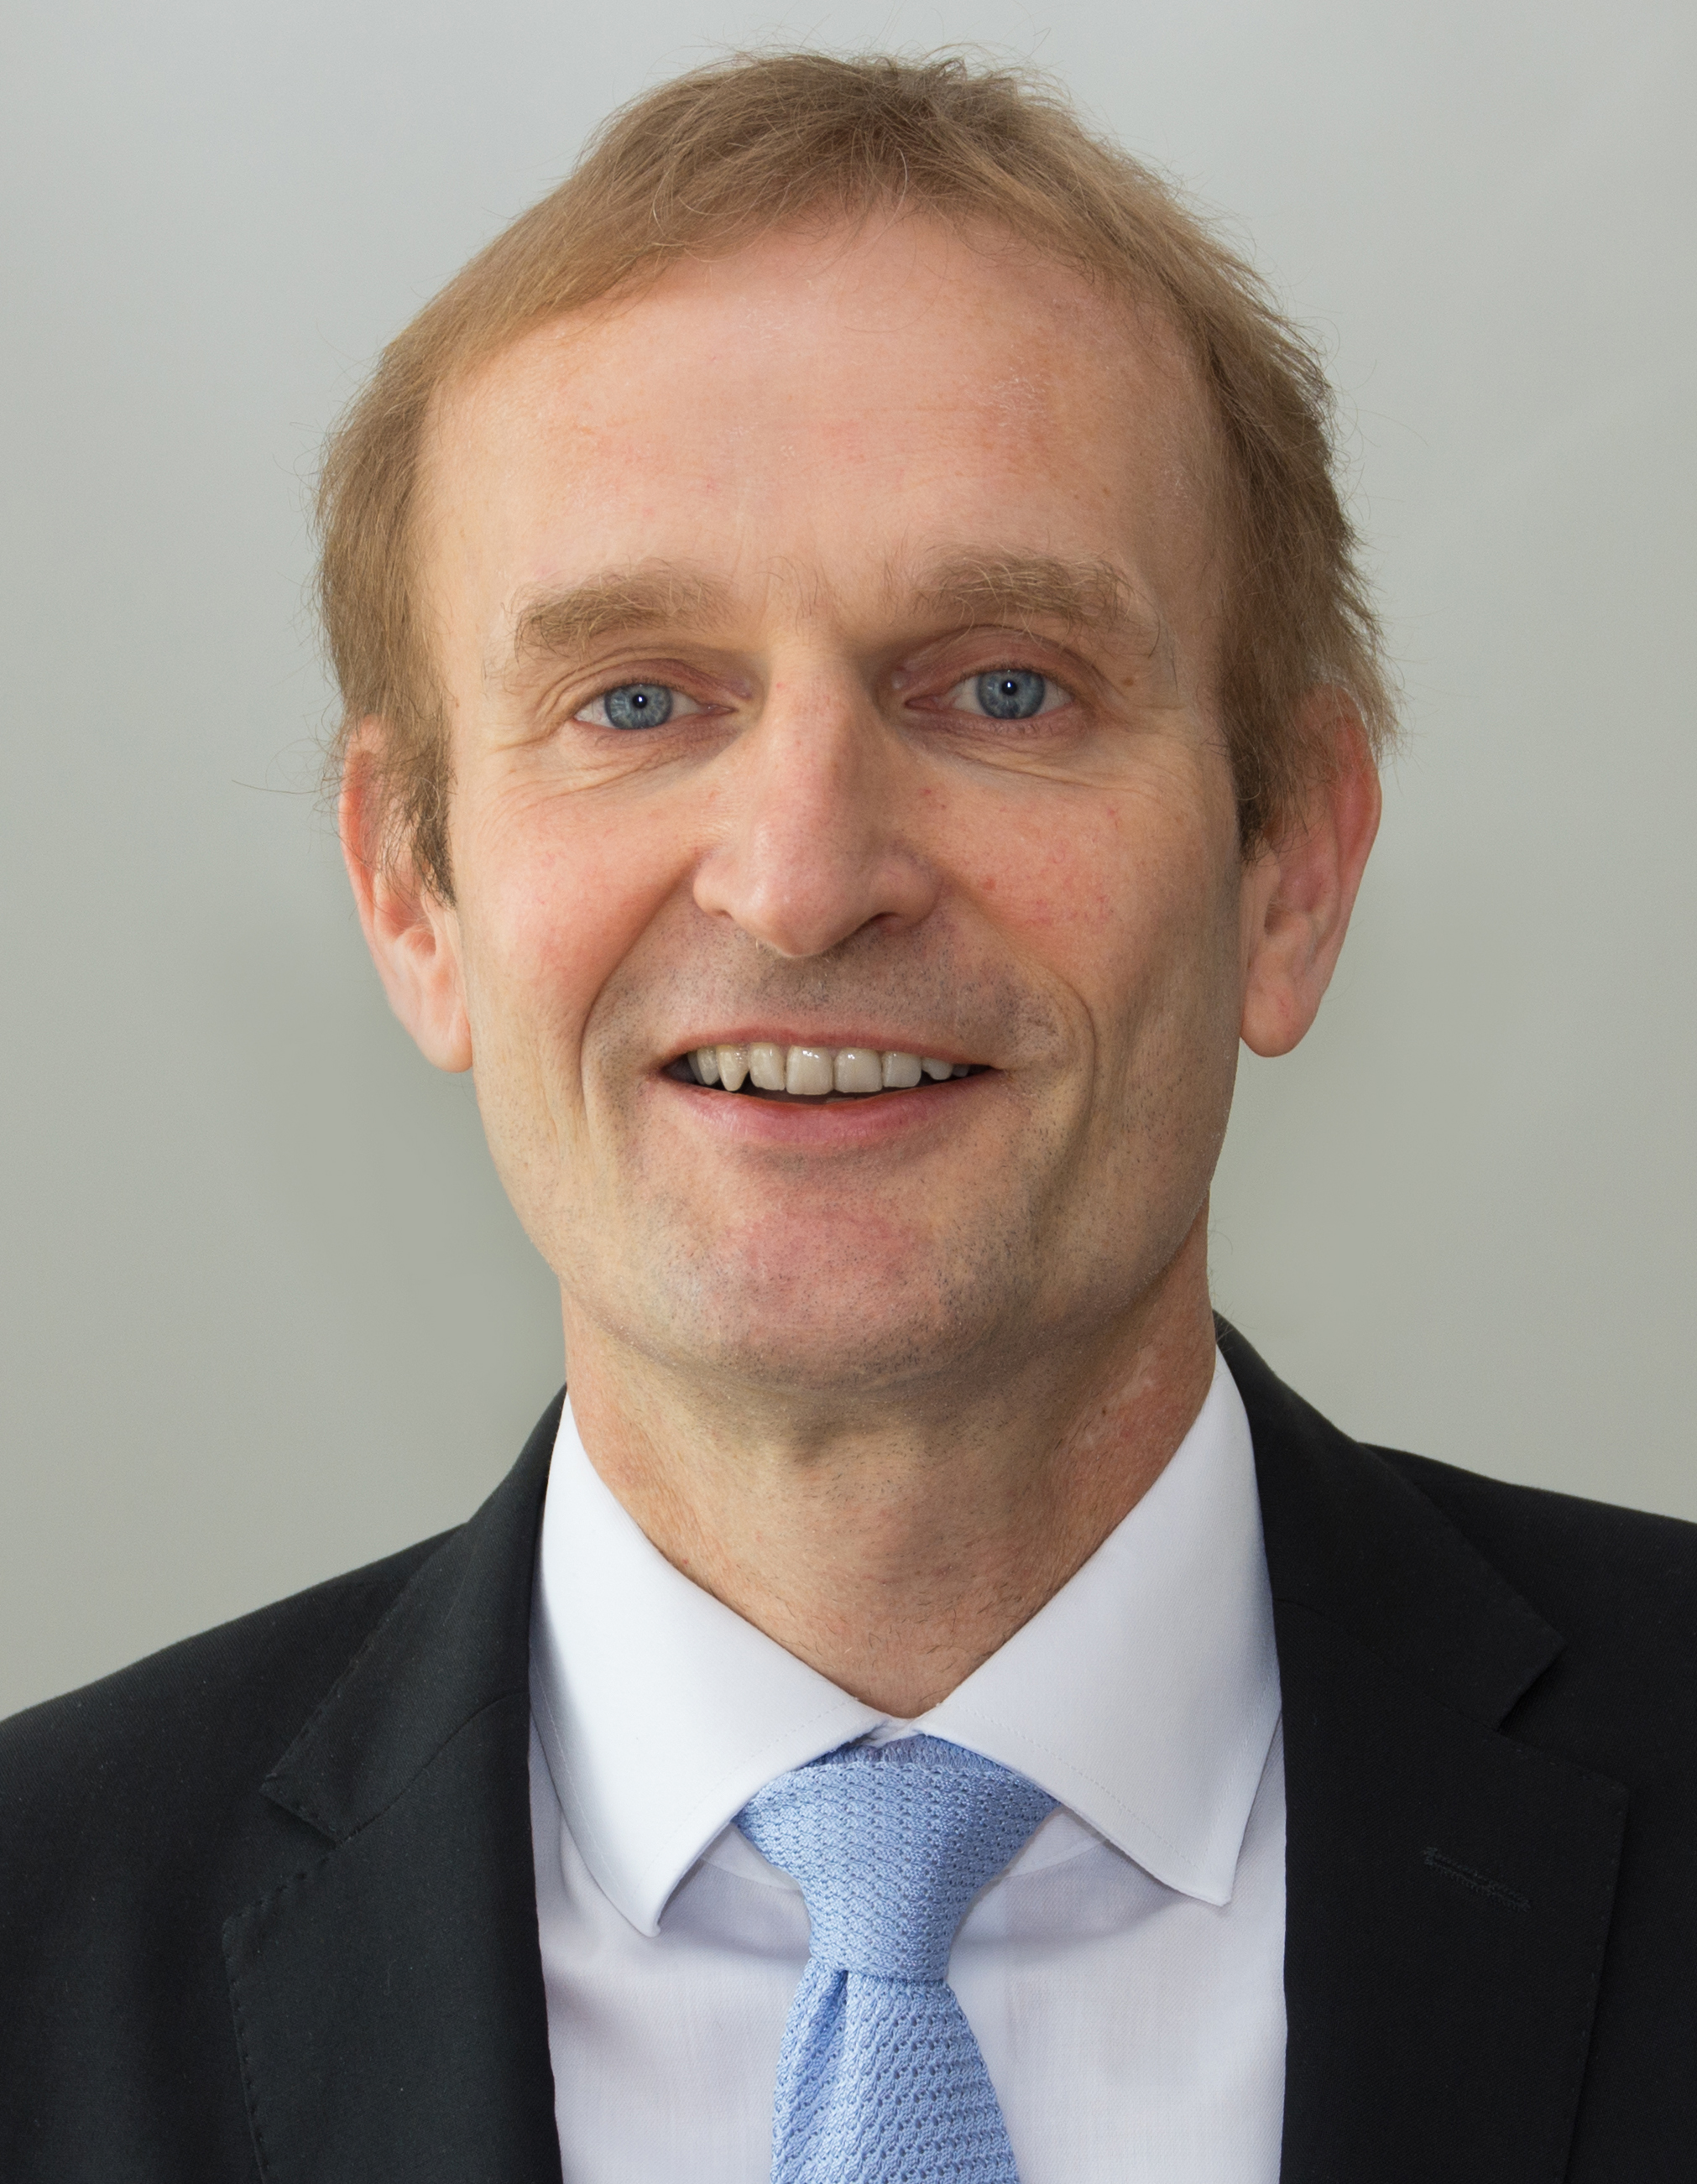 Dr. Henning Stumpp